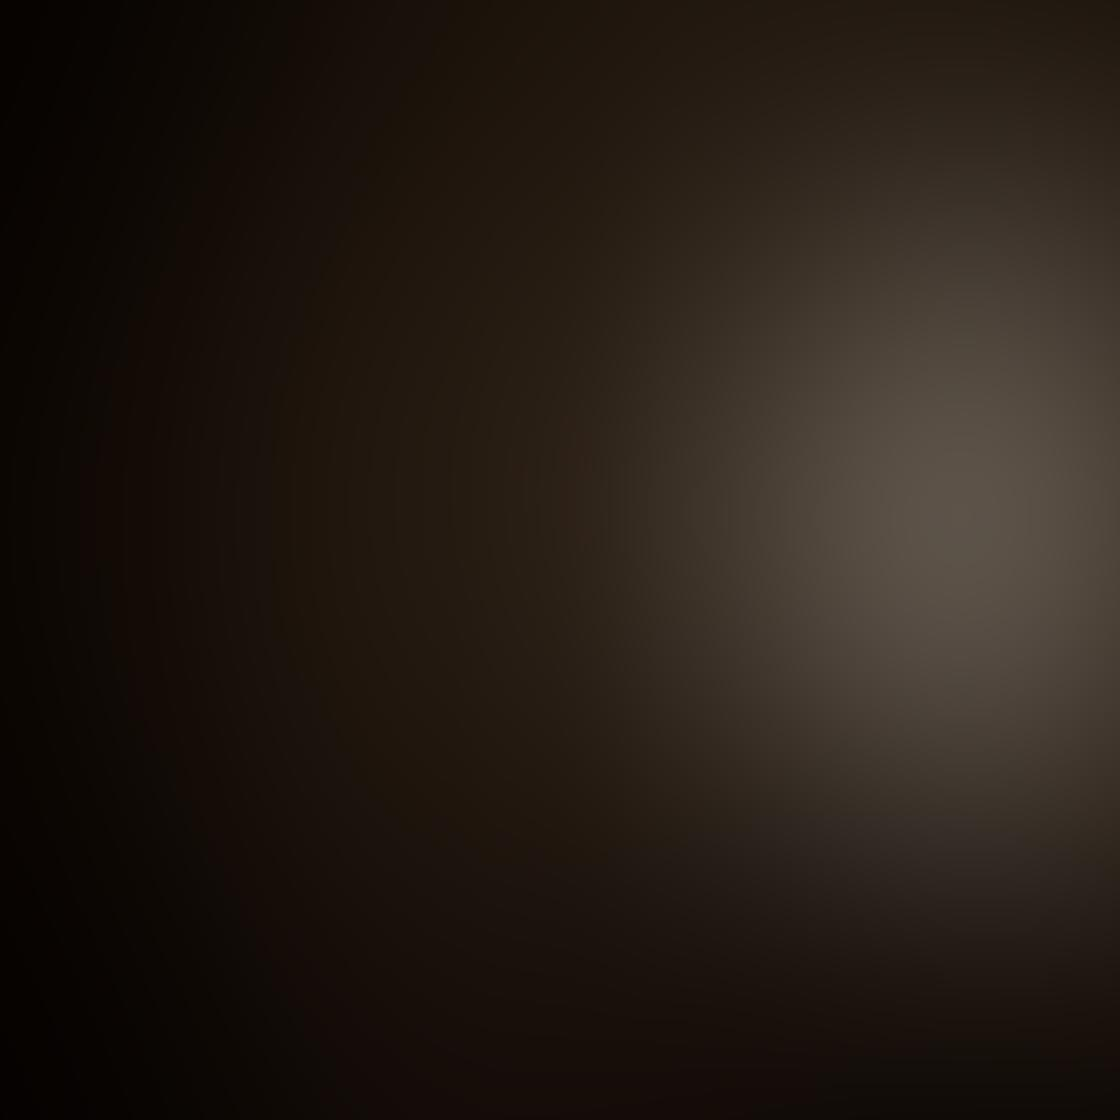 iPhone Portrait Photography 20